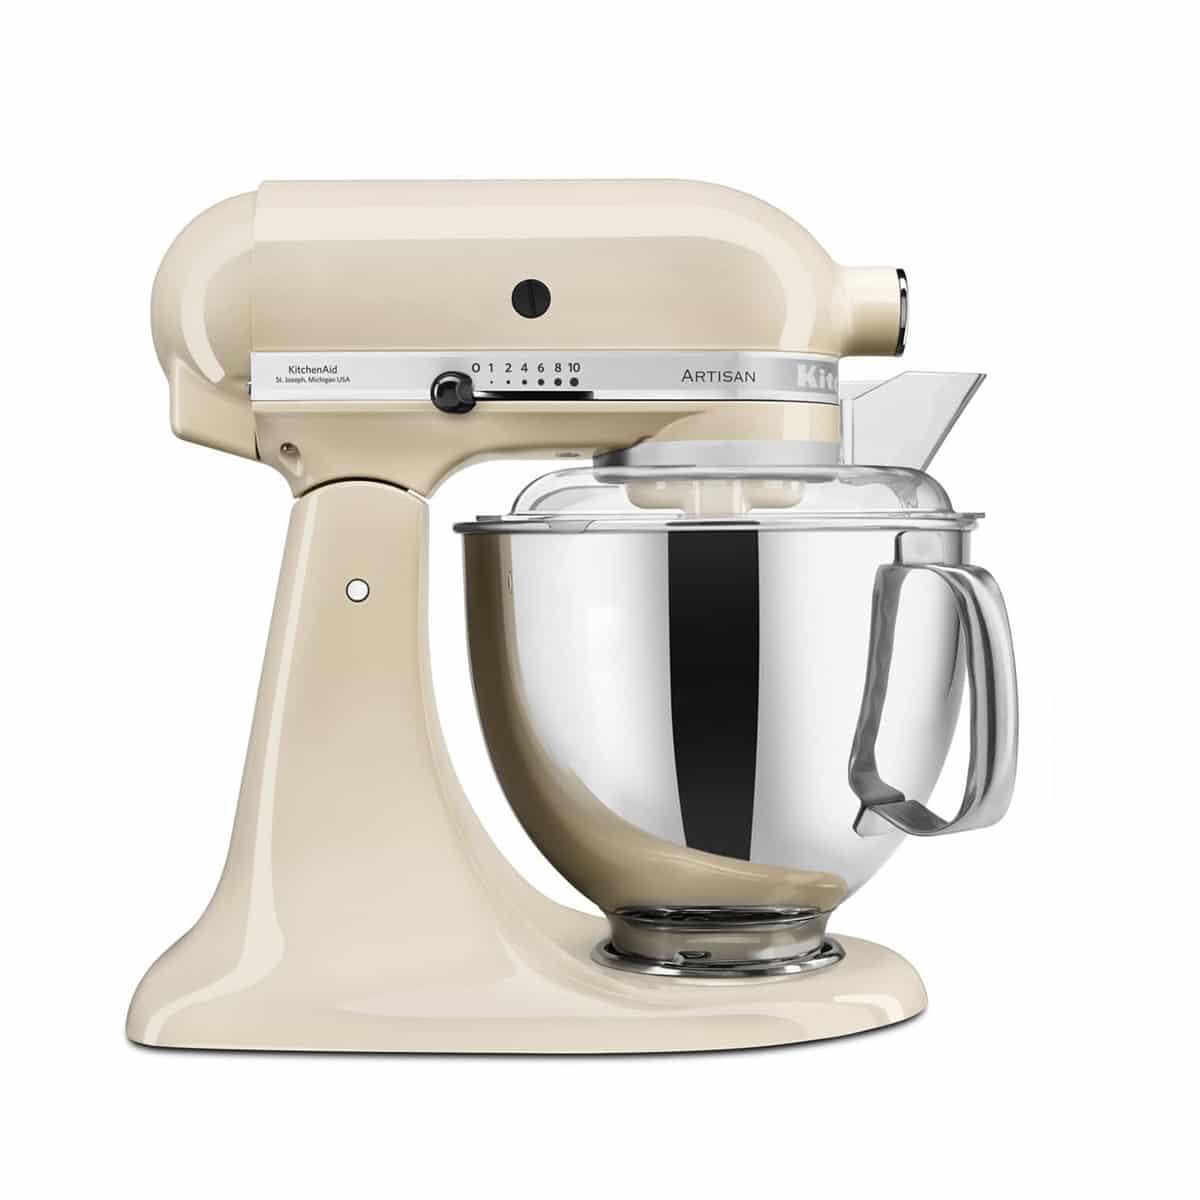 KitchenAid samostojeći mikser Artisan (4,8 l) – 5KSM175PS - BoysenberryKitchenAid samostojeći mikser Artisan (4,8 l) – 5KSM175PS - Almond Cream